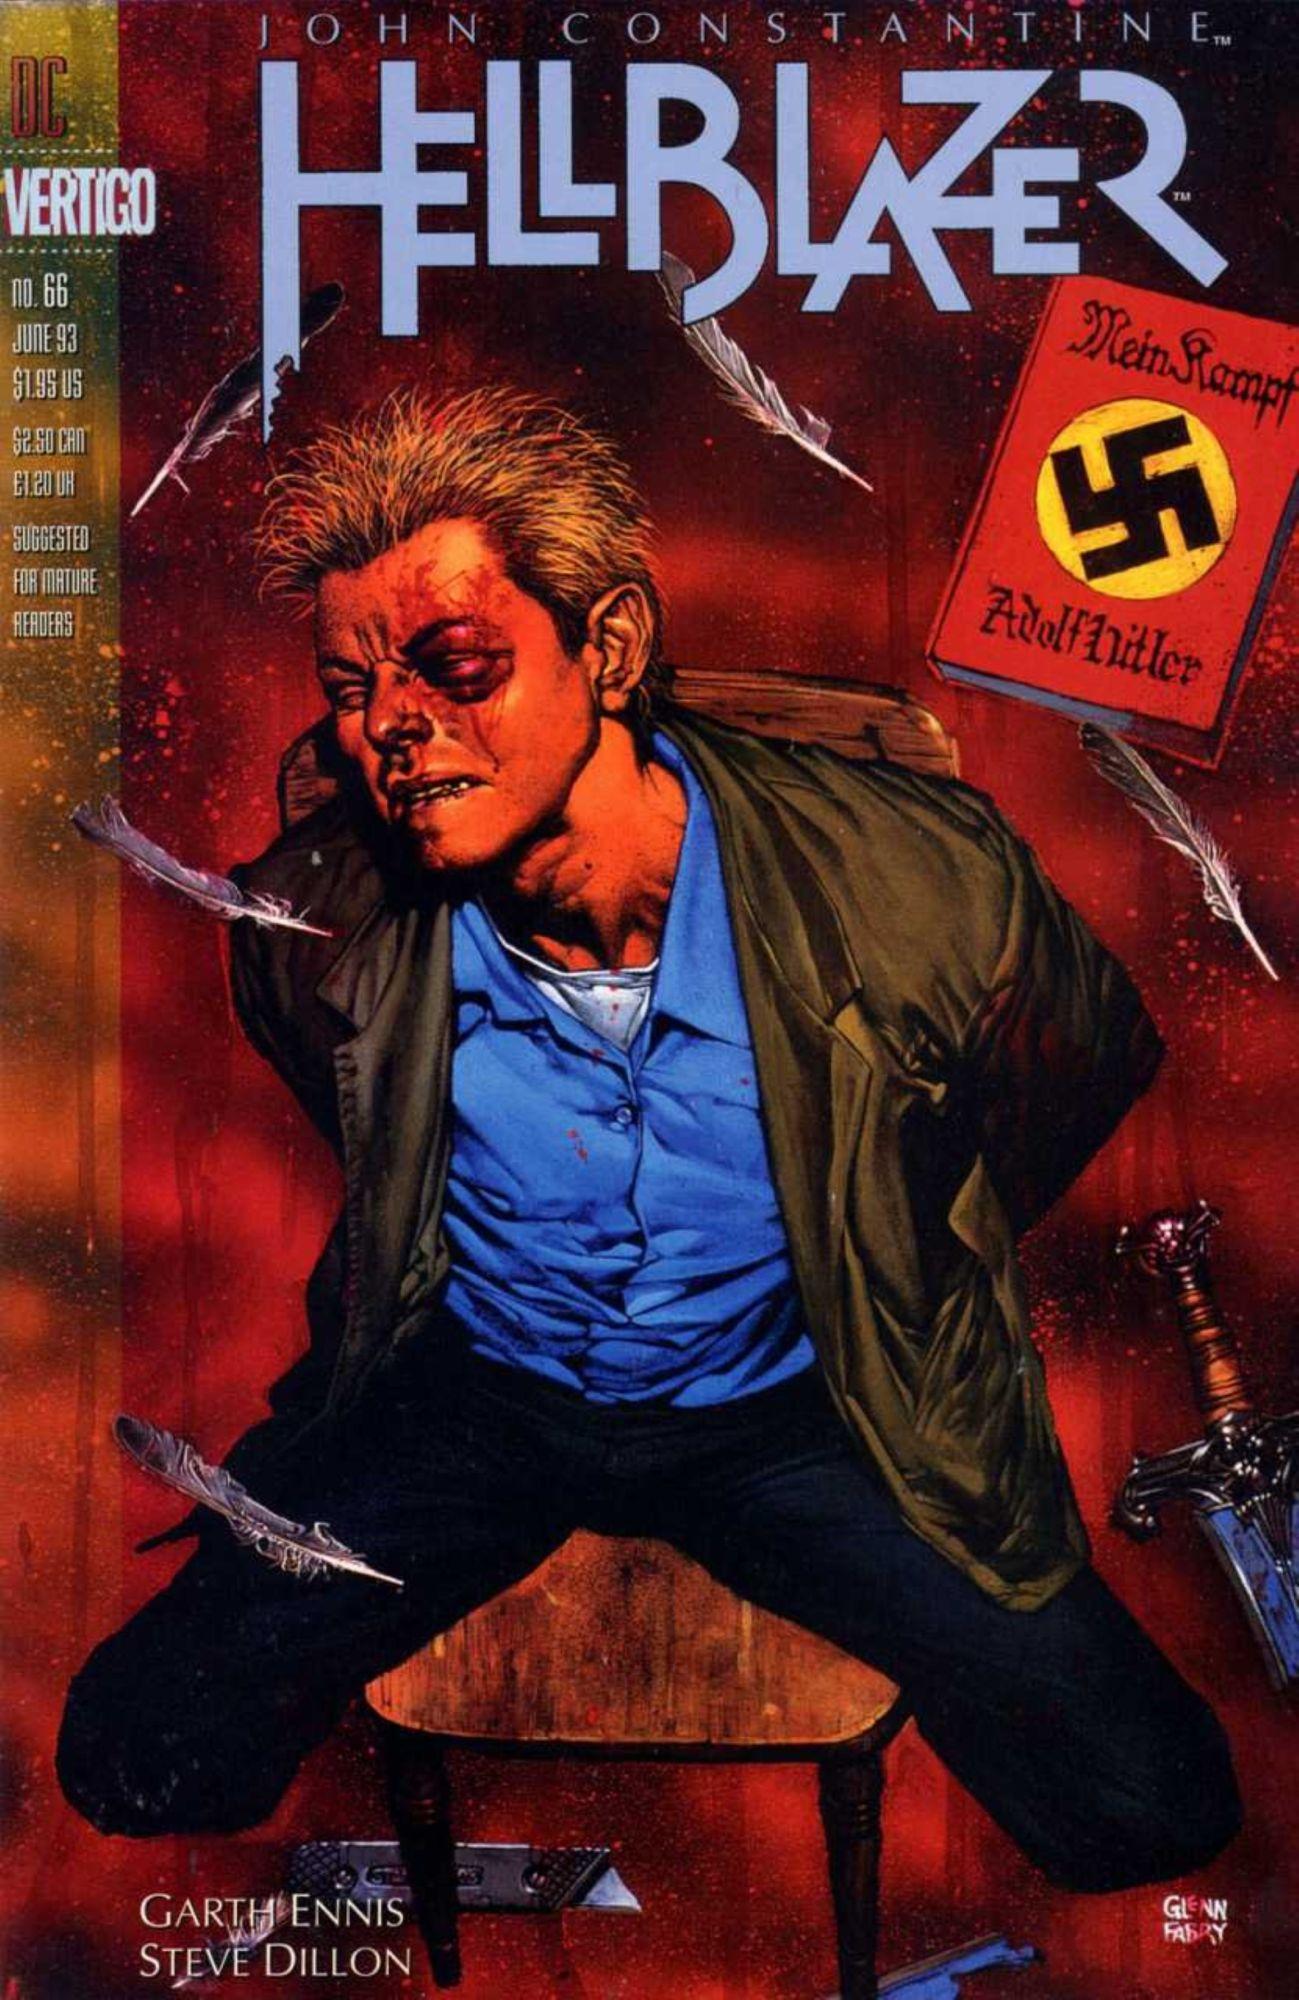 DC to Publish All of Garth Ennis' John Constantine: Hellblazer Comics in One Fat Omnibus